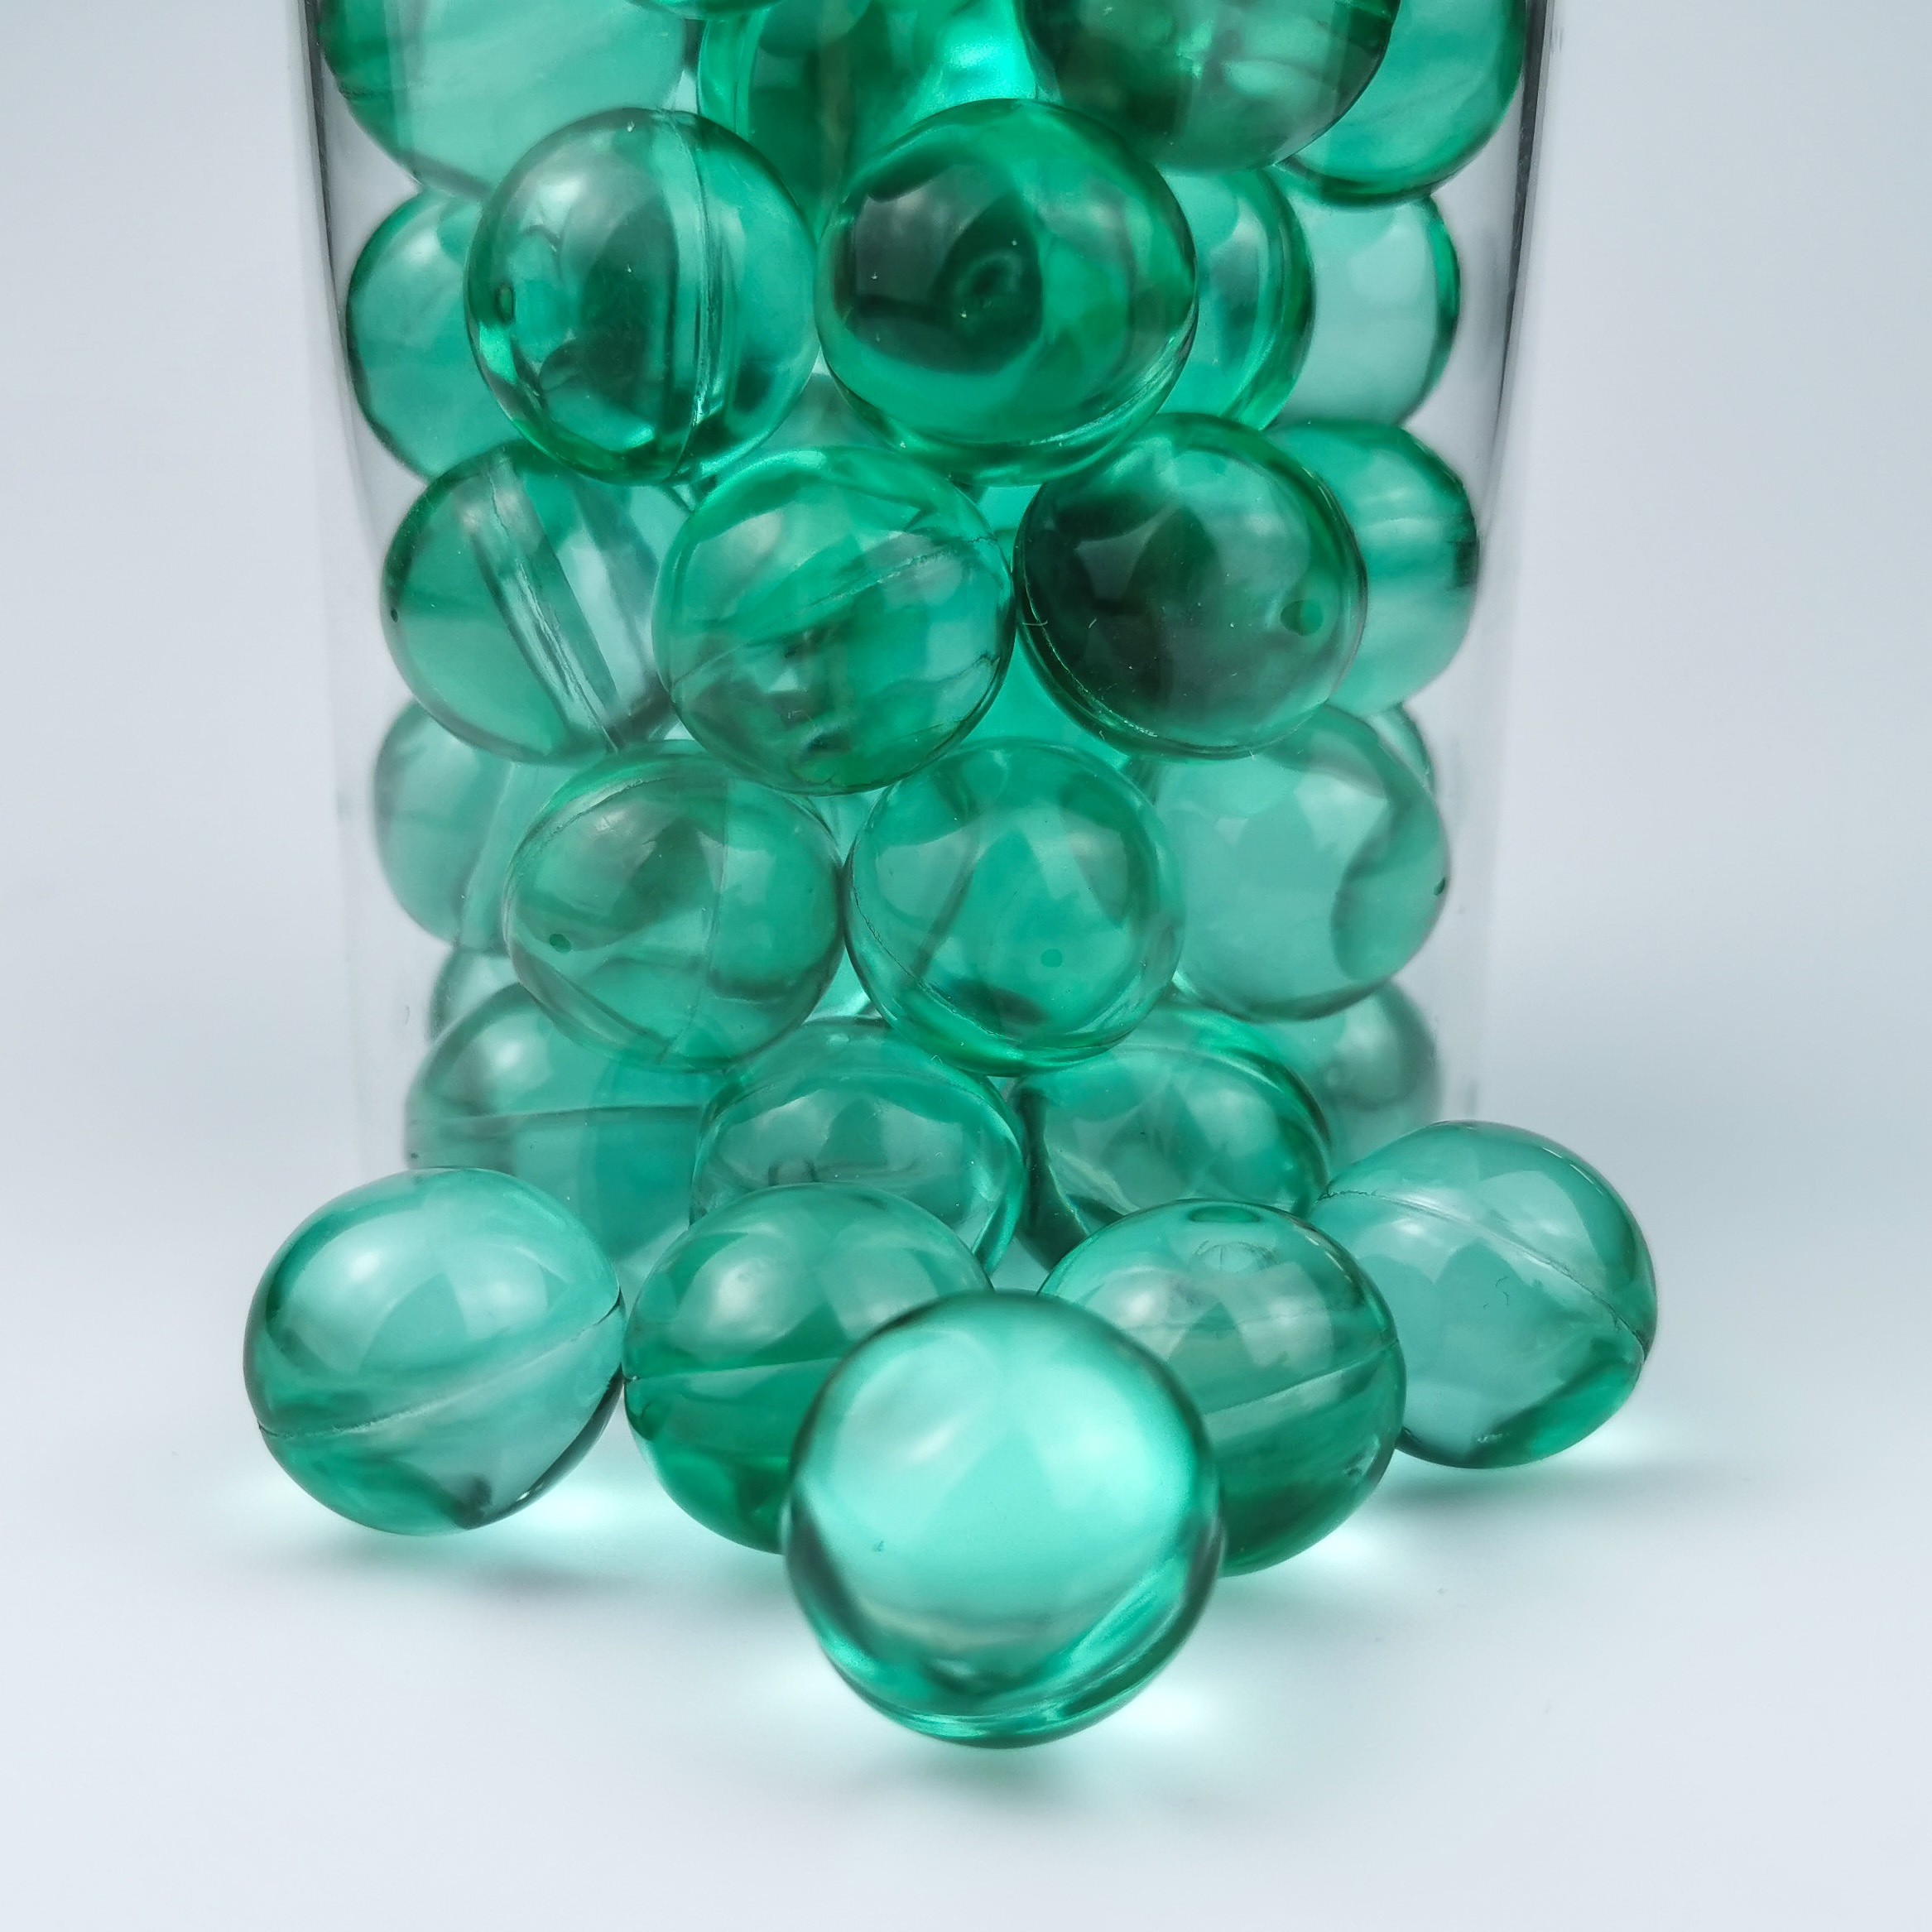 Bath Ball Beads Capsule Moisturize And Soften Skin Long-lasting Cantaloupe Fragrance No Gelatin Residue In Bathtub